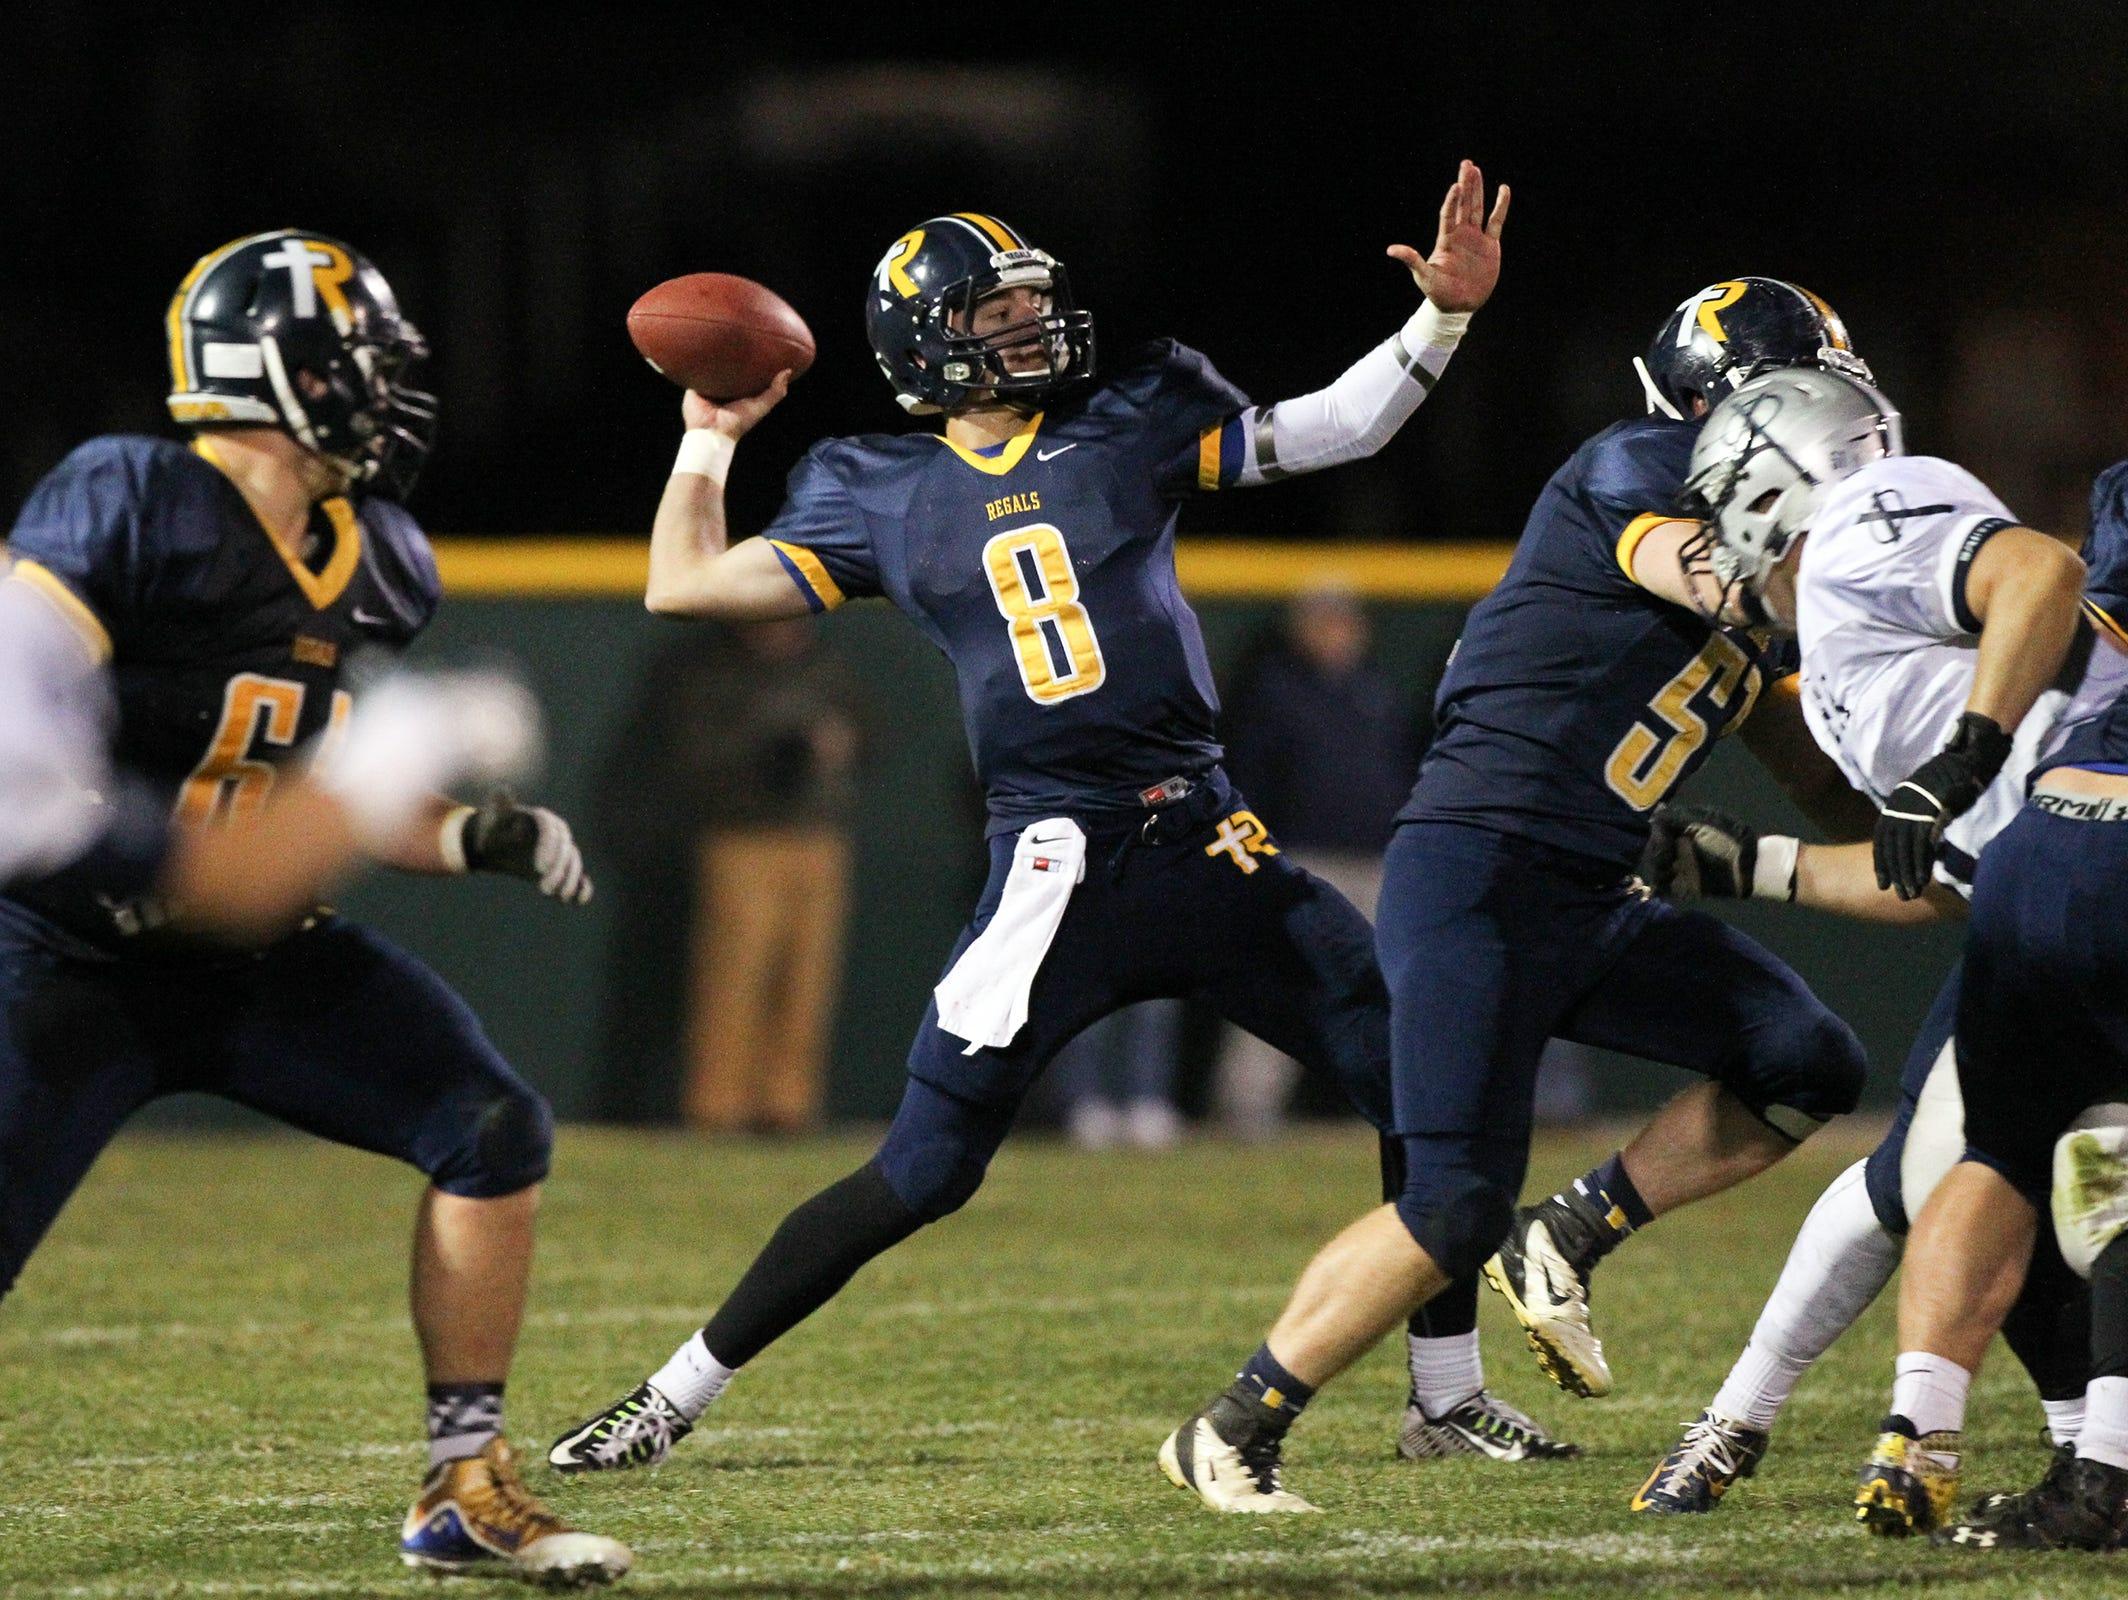 Regina quarterback Nate Stenger throws down field during the Regals' game against Cedar Rapids Xavier on Friday, Oct. 16, 2015.